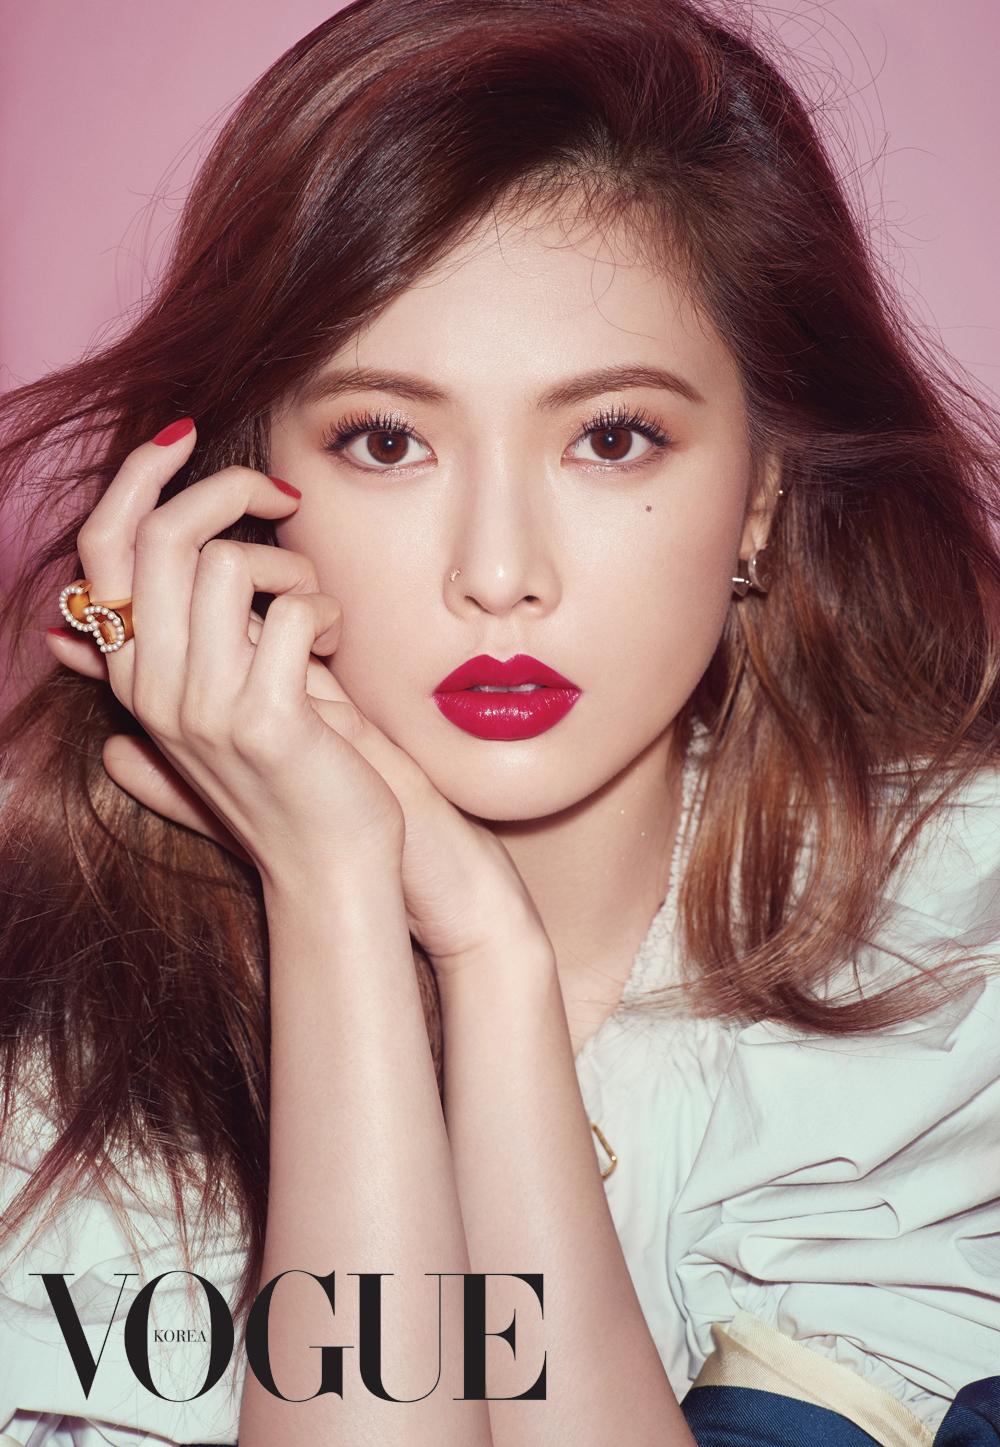 4minute HyunA in Vogue Korea March 2017 Look 1 | Азиатская ... Hyuna 2019